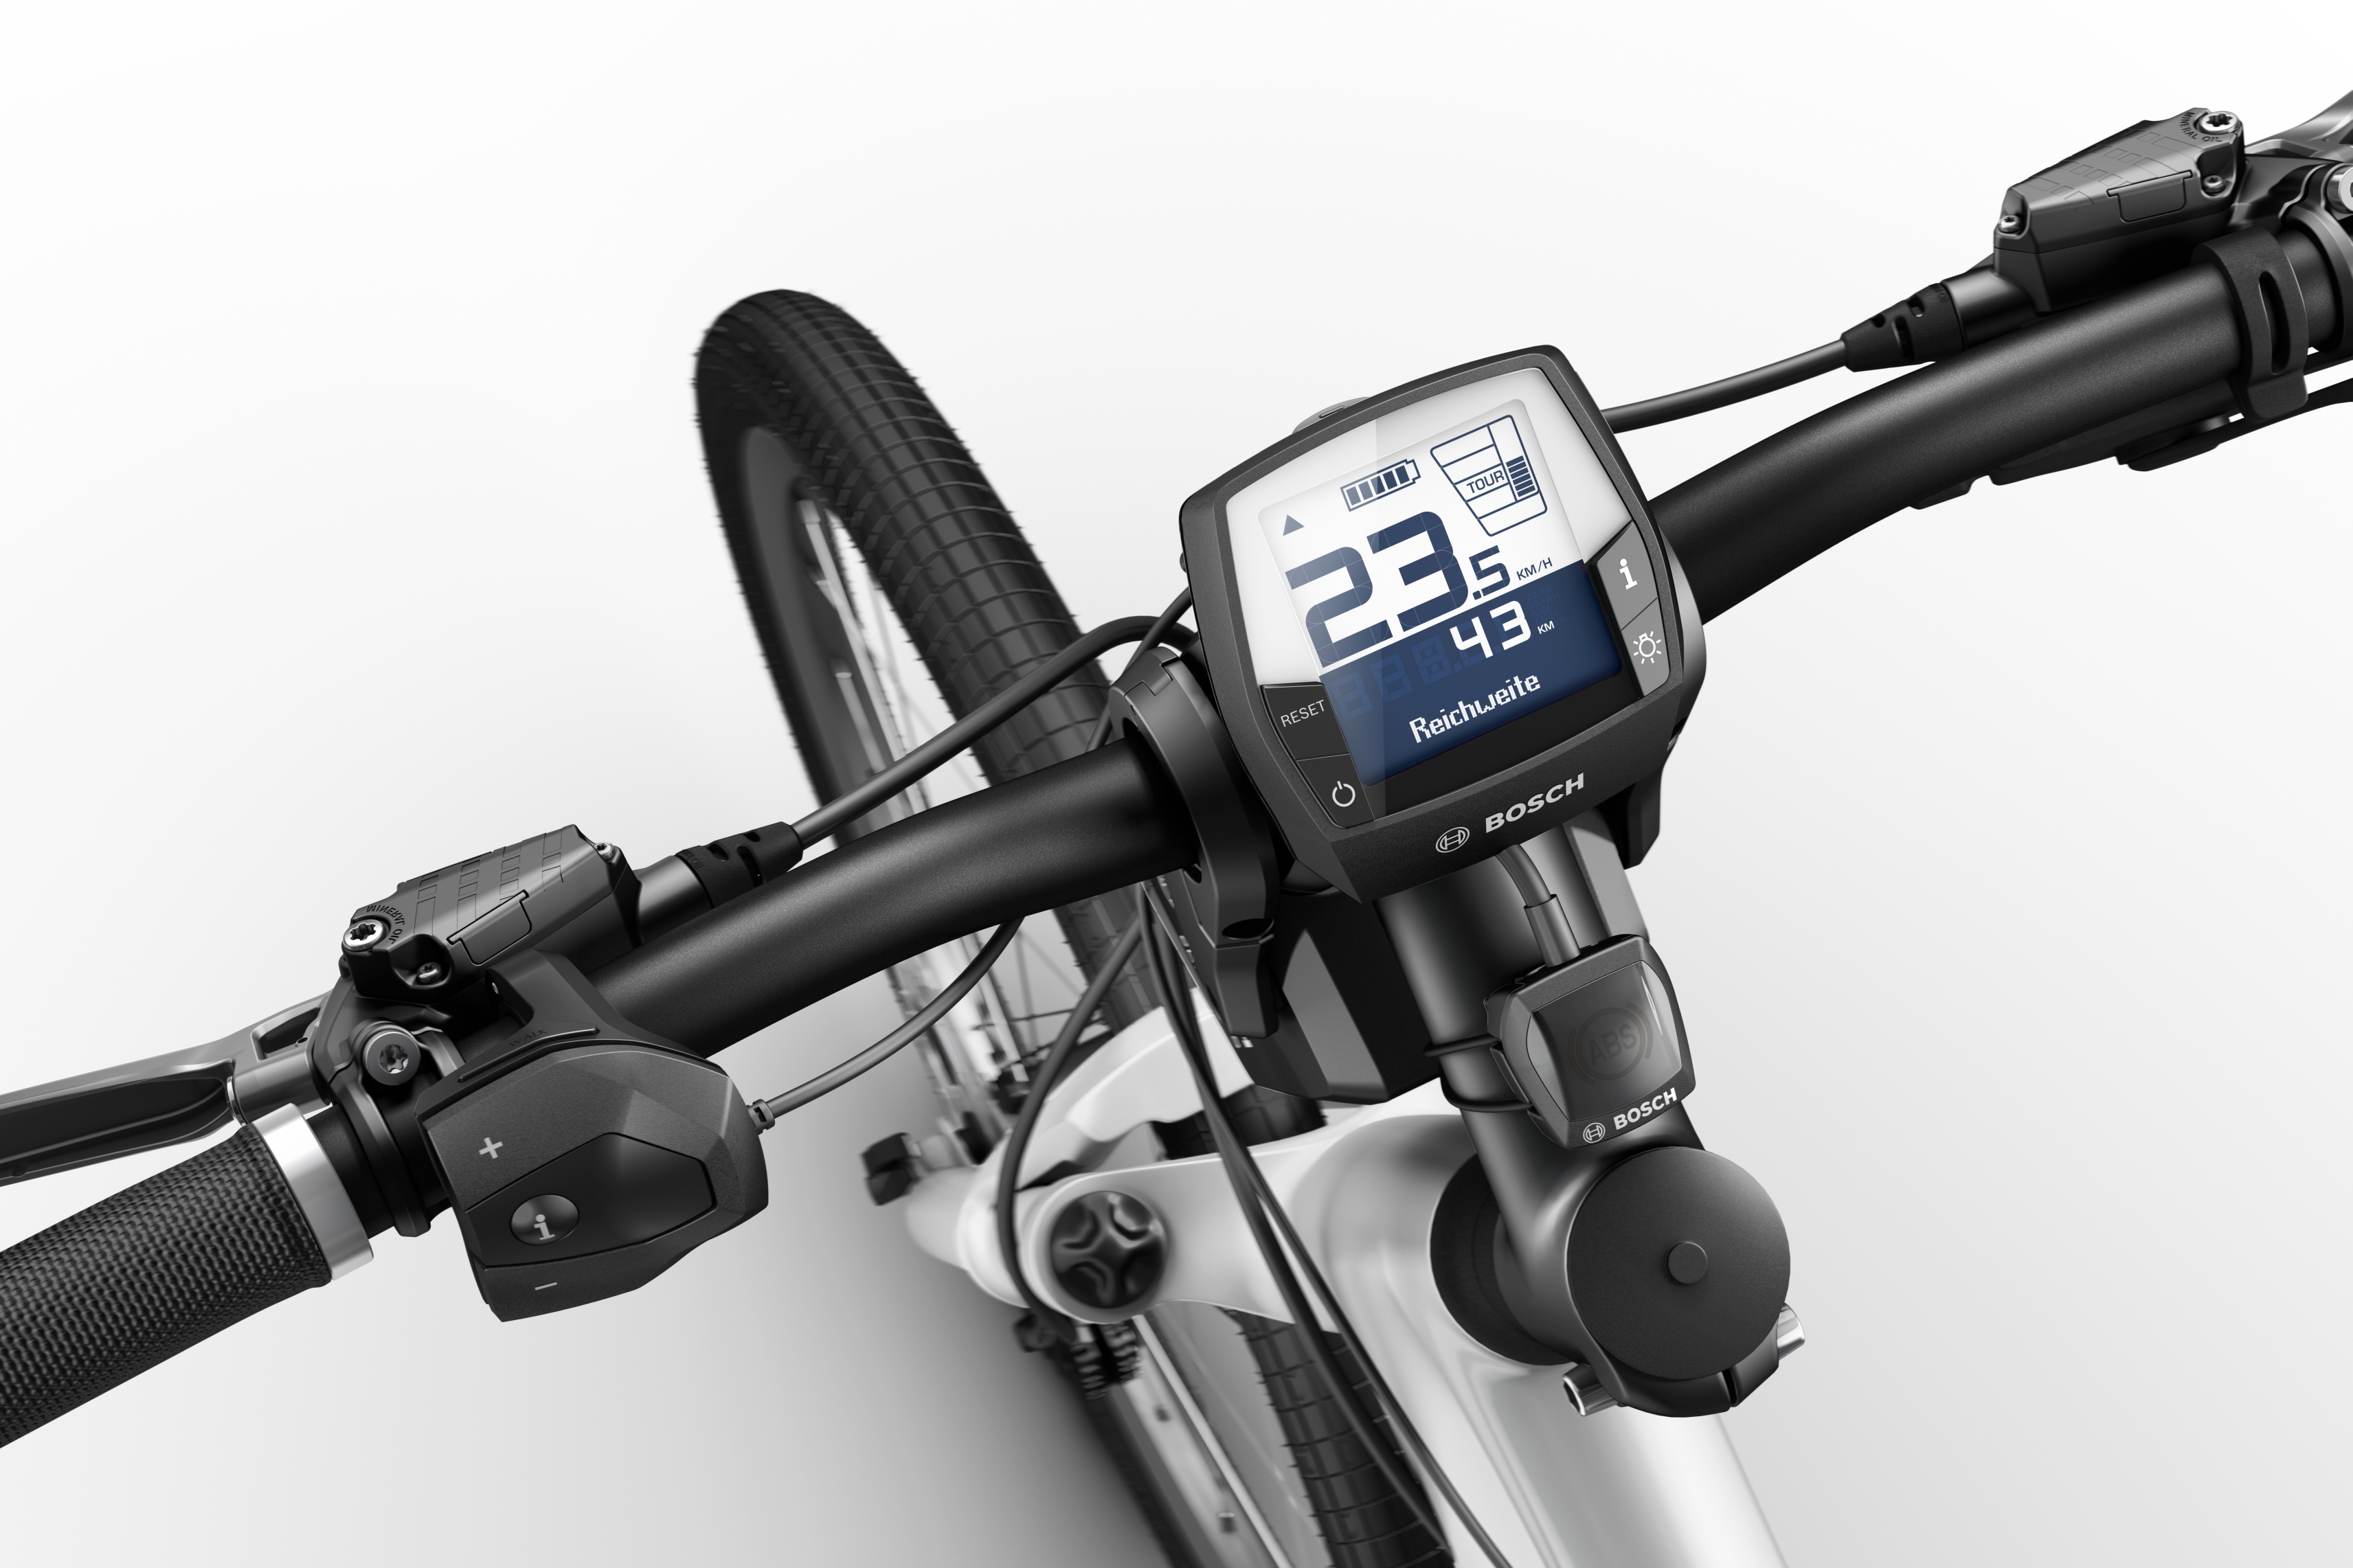 eBike ABS by Bosch